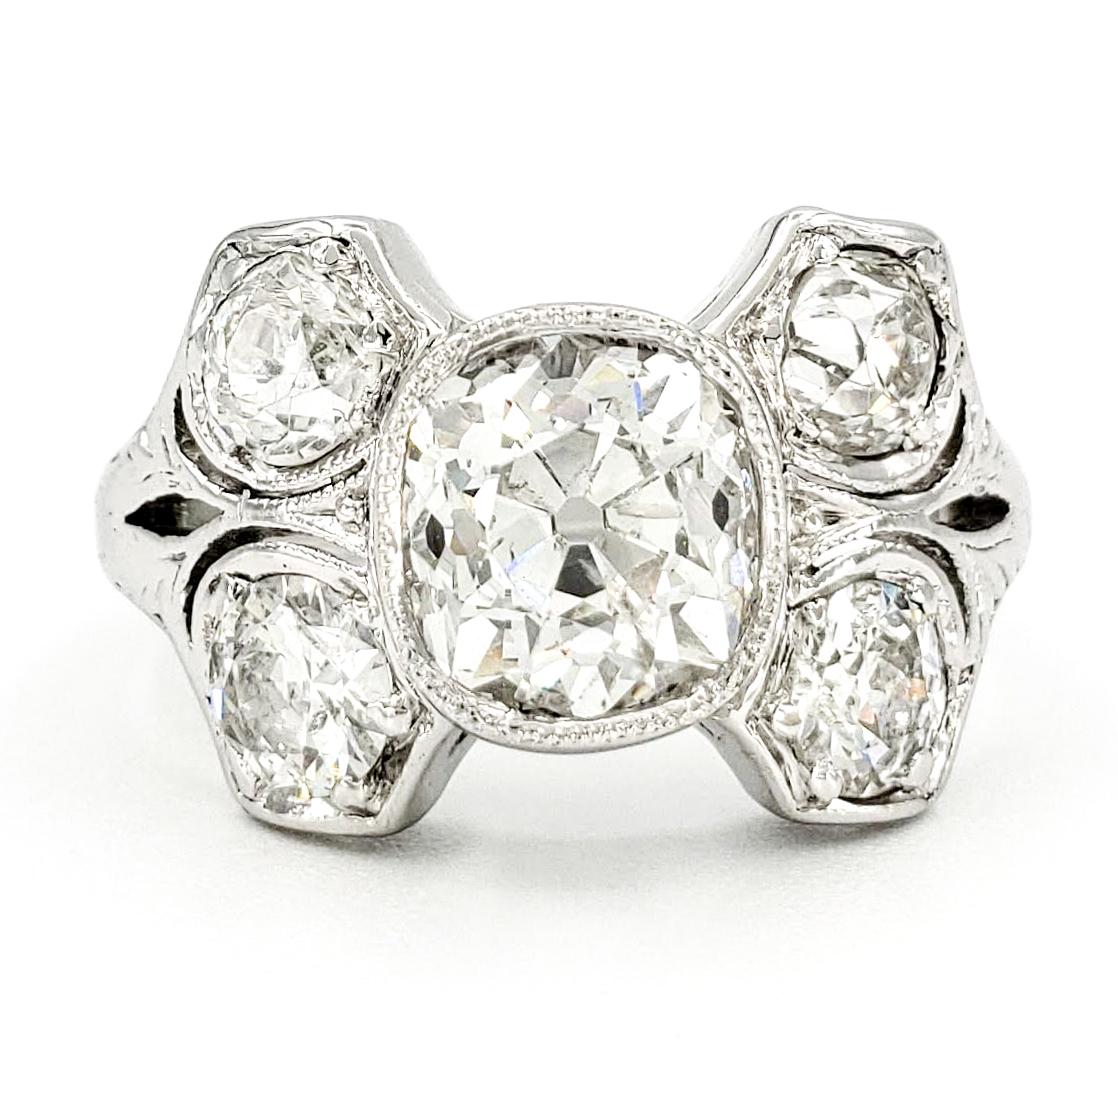 vintage-platinum-engagement-ring-with-1-41-carat-old-mine-cut-diamond-egl-h-si2